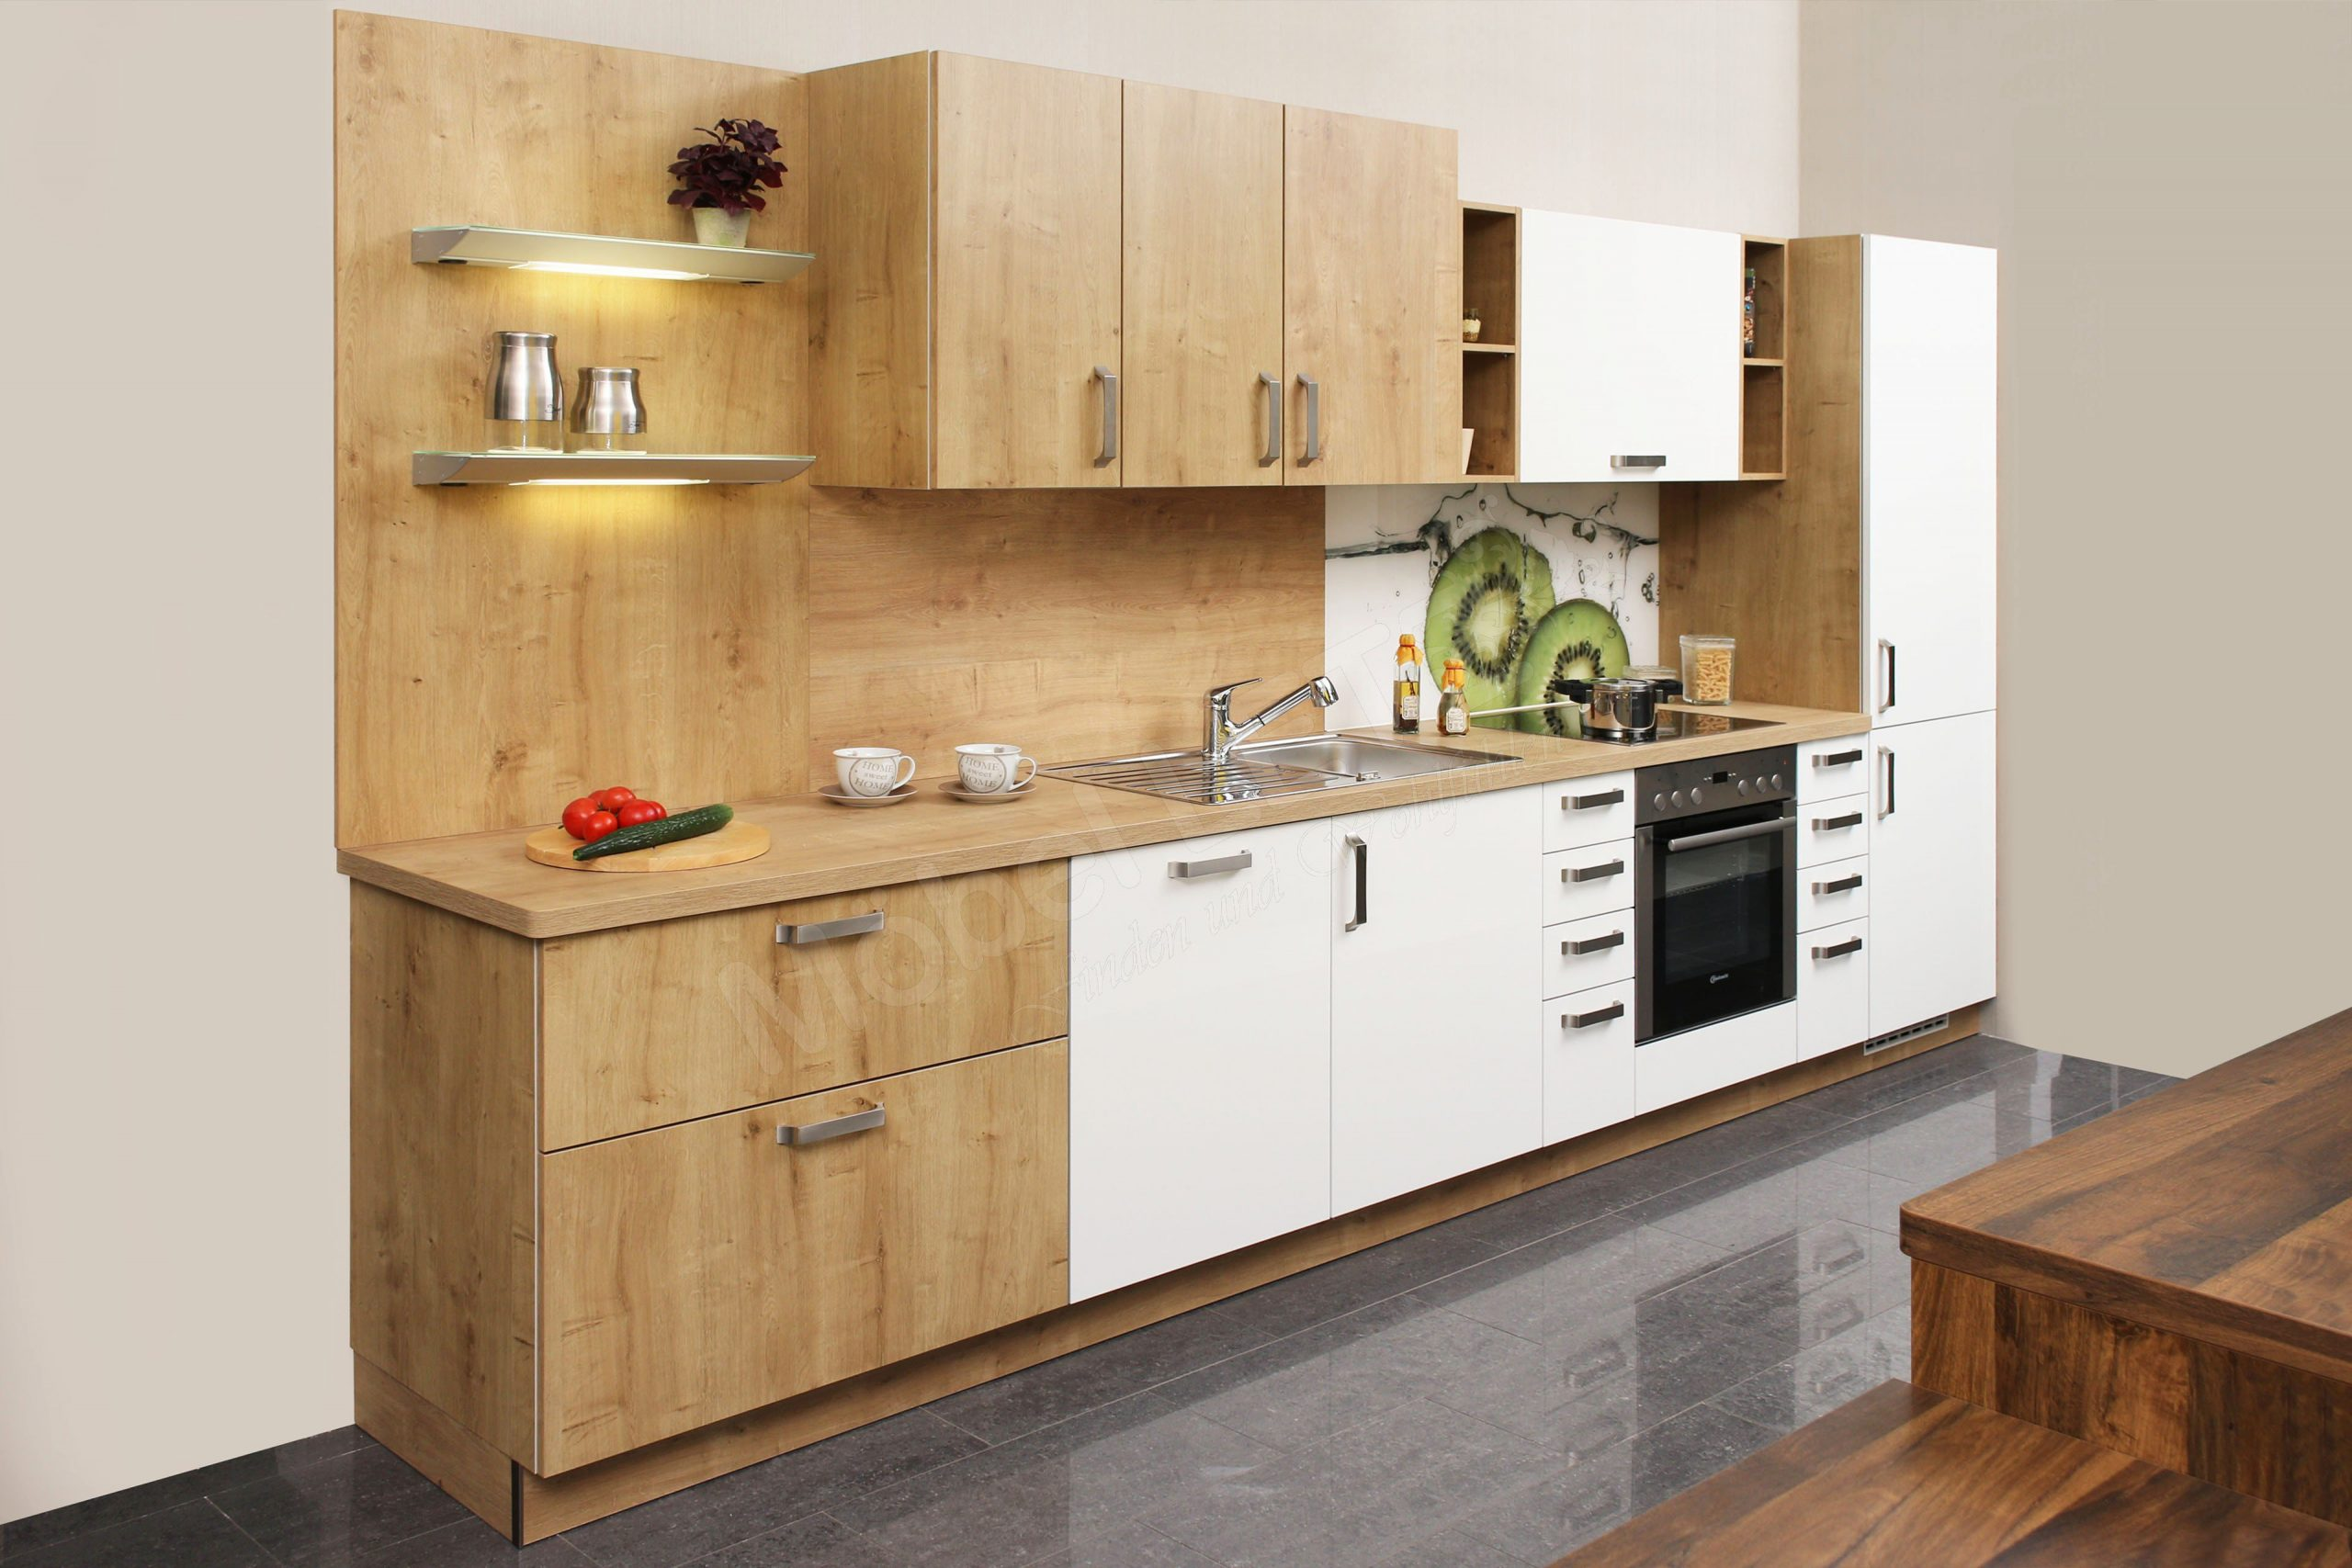 Full Size of Küchenblende Boden Küchenblende Wand Küche Blende Geschirrspüler Sockelblende Küche 10 Cm Küche Küche Blende